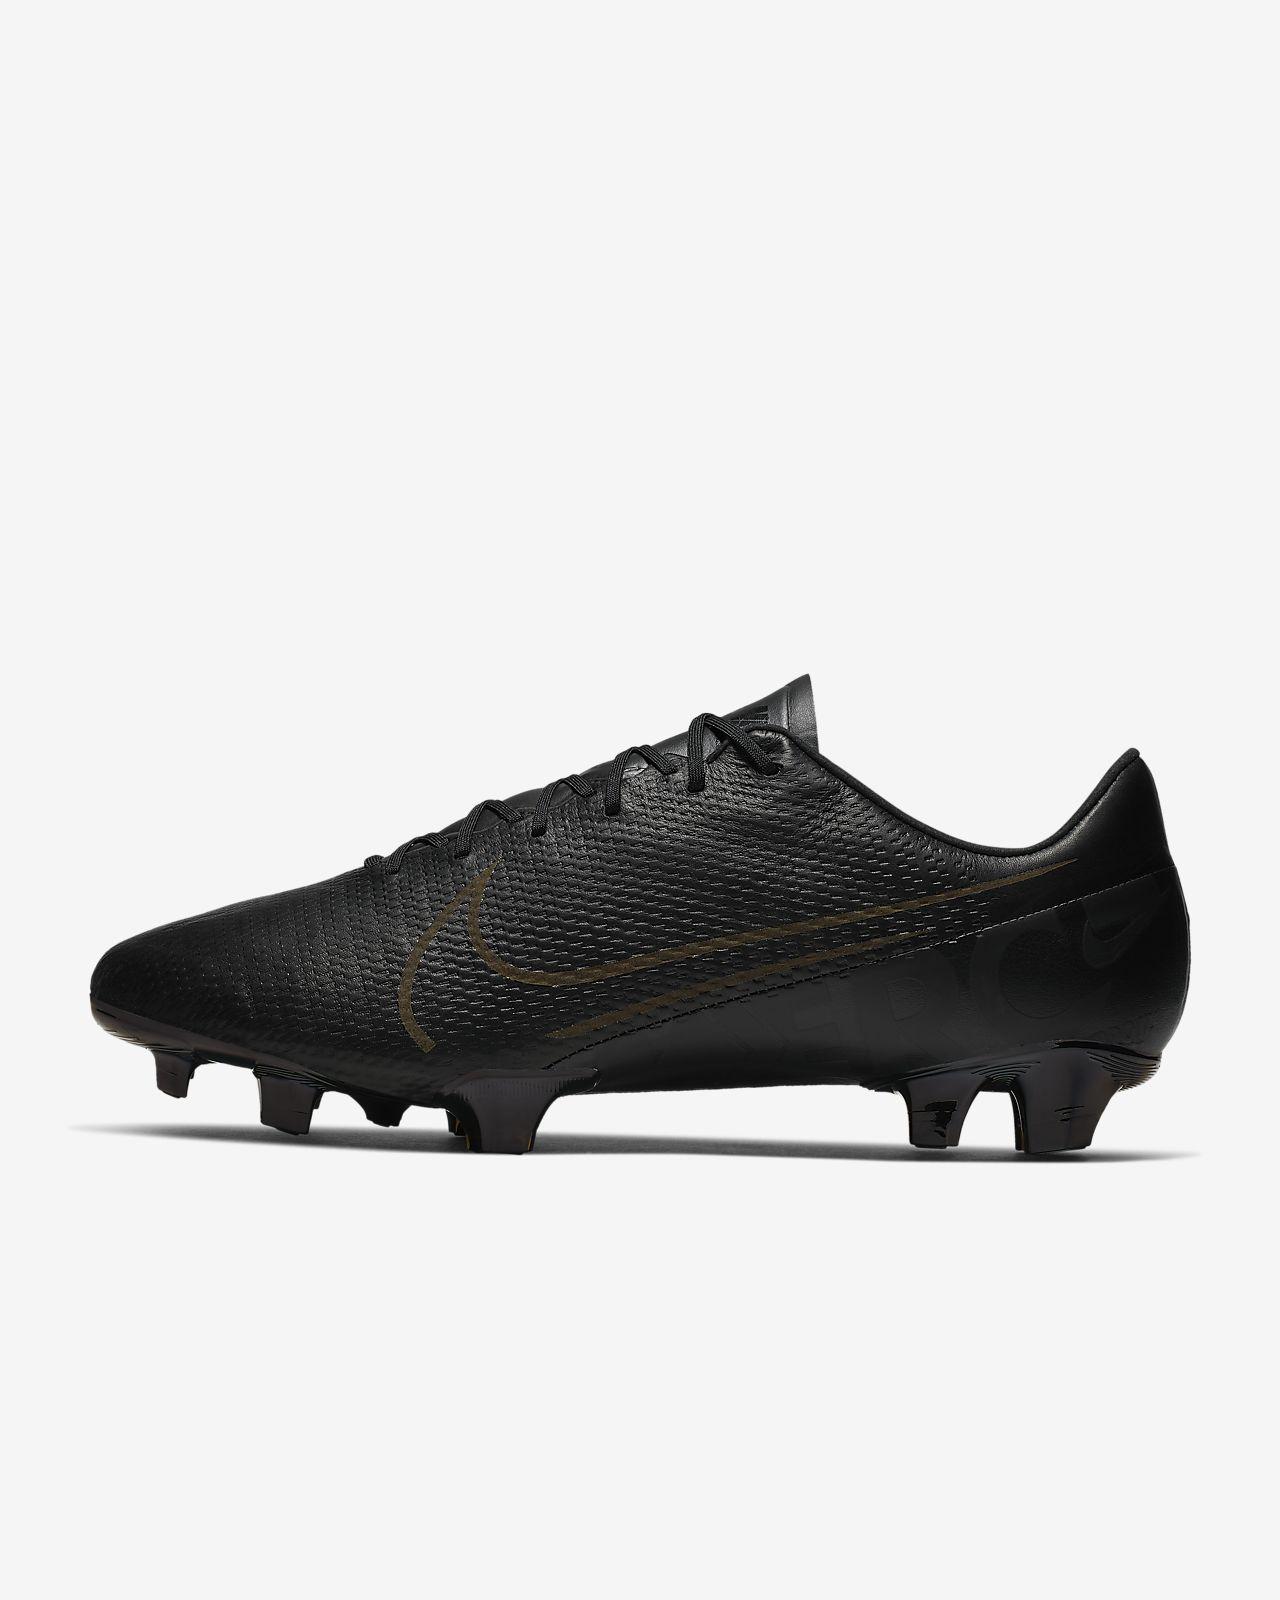 shoes for cheap sale uk online retailer Nike Mercurial Vapor 13 Elite Tech Craft FG Voetbalschoen (stevige  ondergrond)